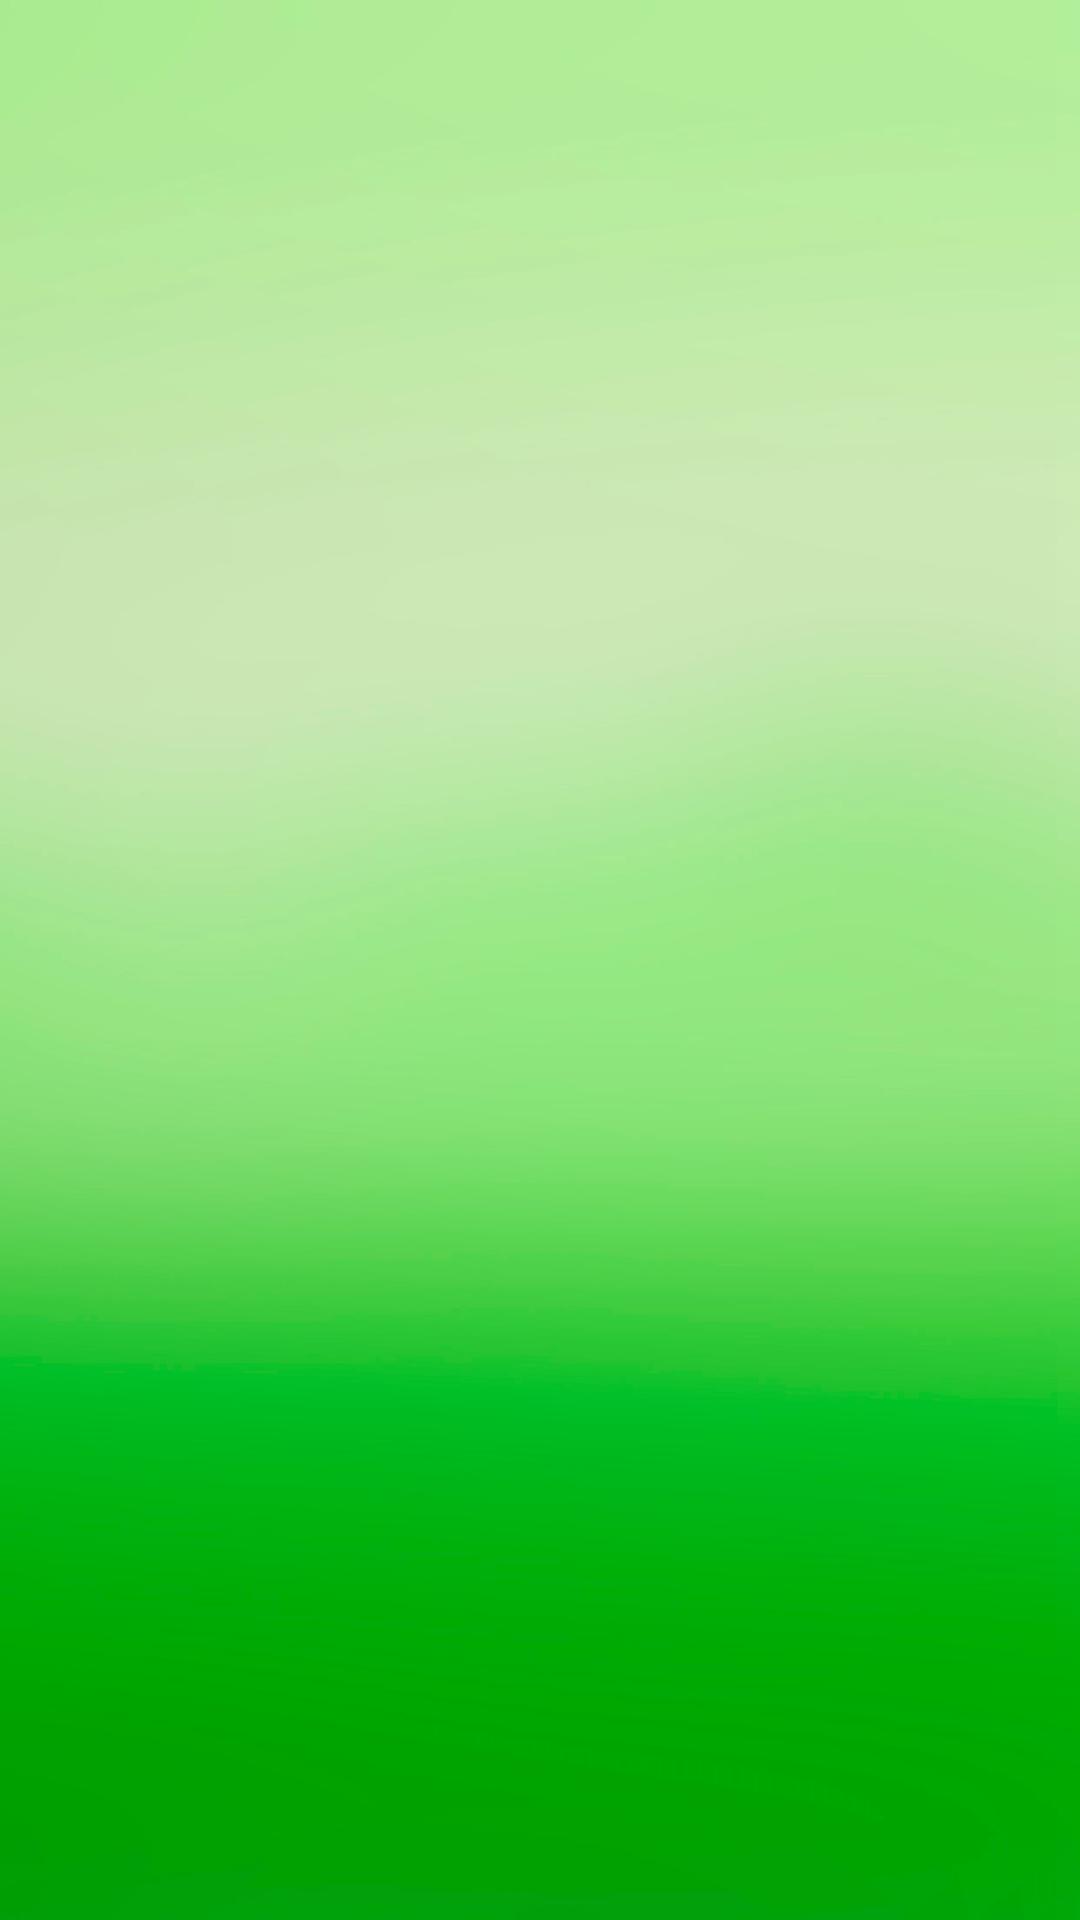 Abstract-Green-Blur-Gradation-iPhone-wallpaper-wp3002975